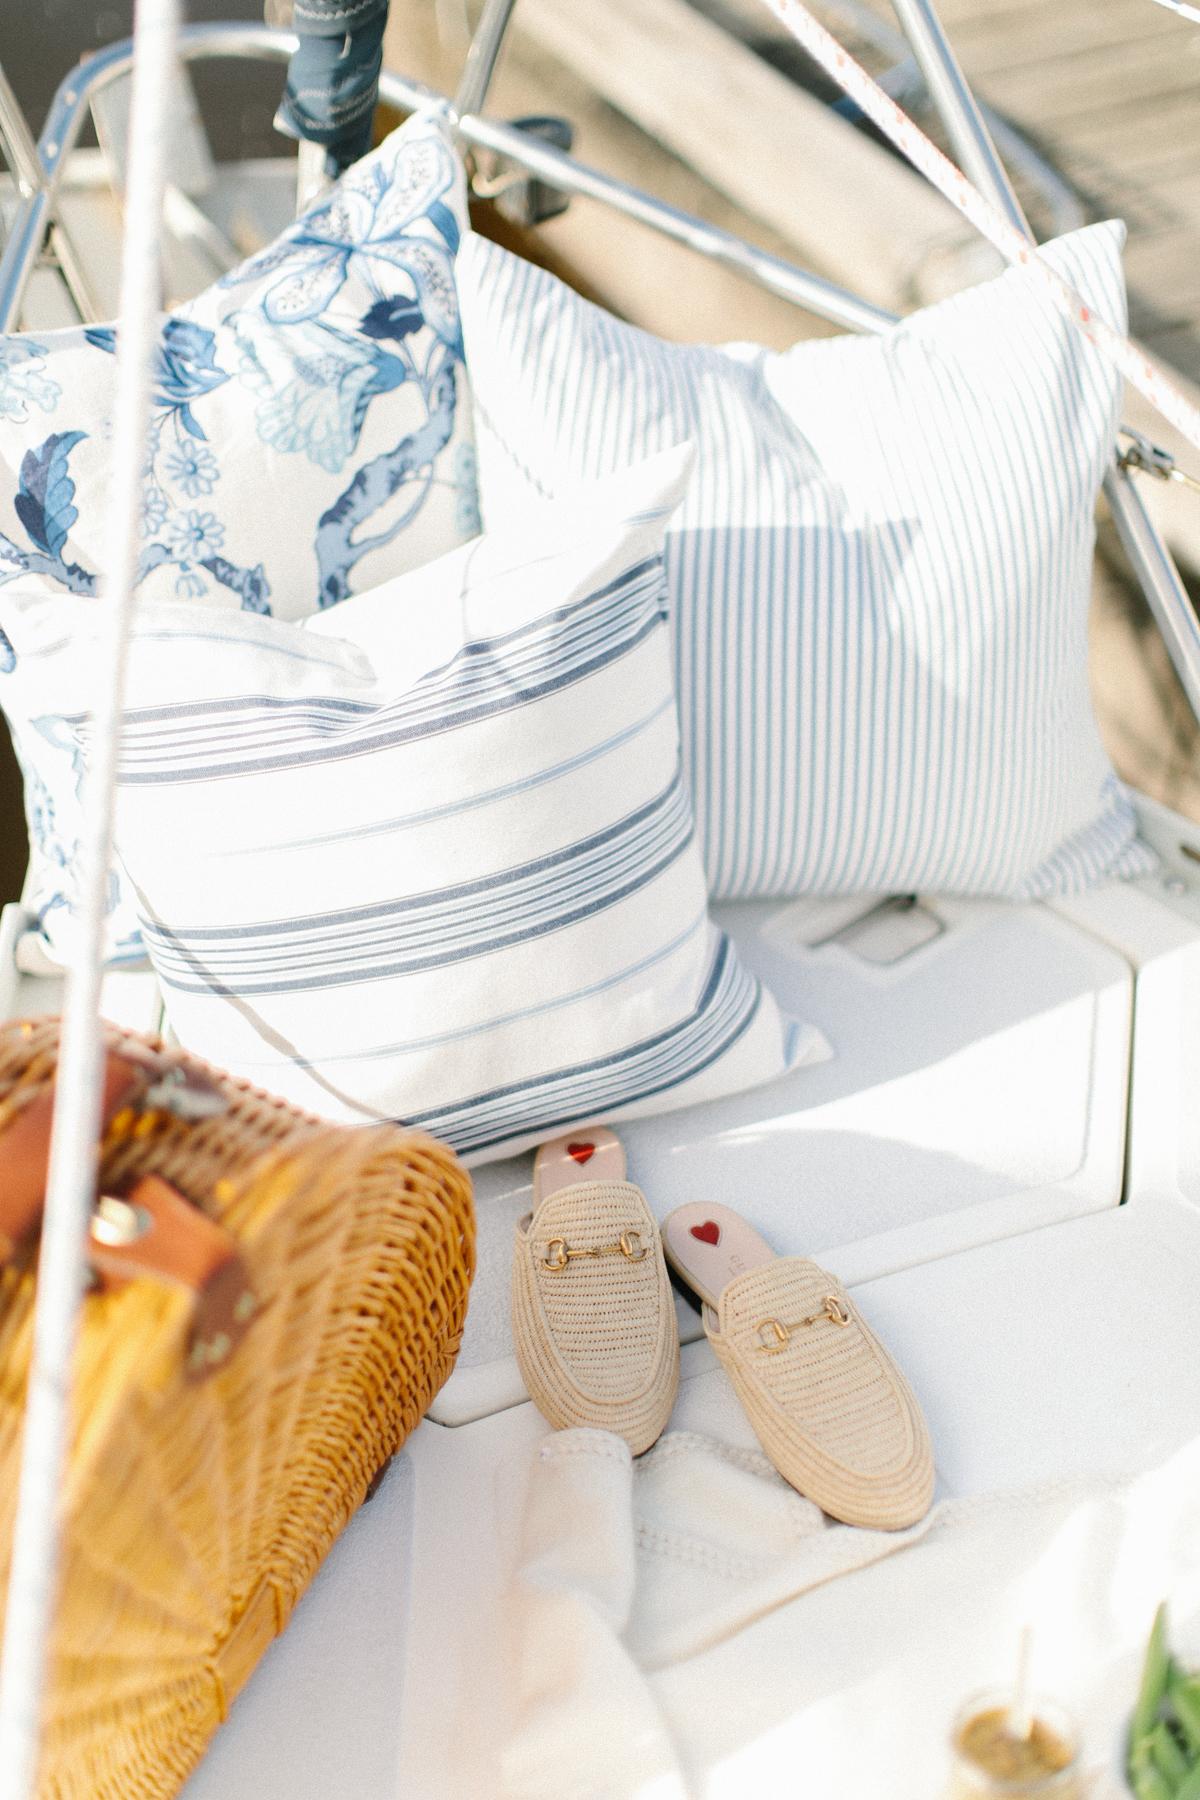 A Summer Picnic out Sailing